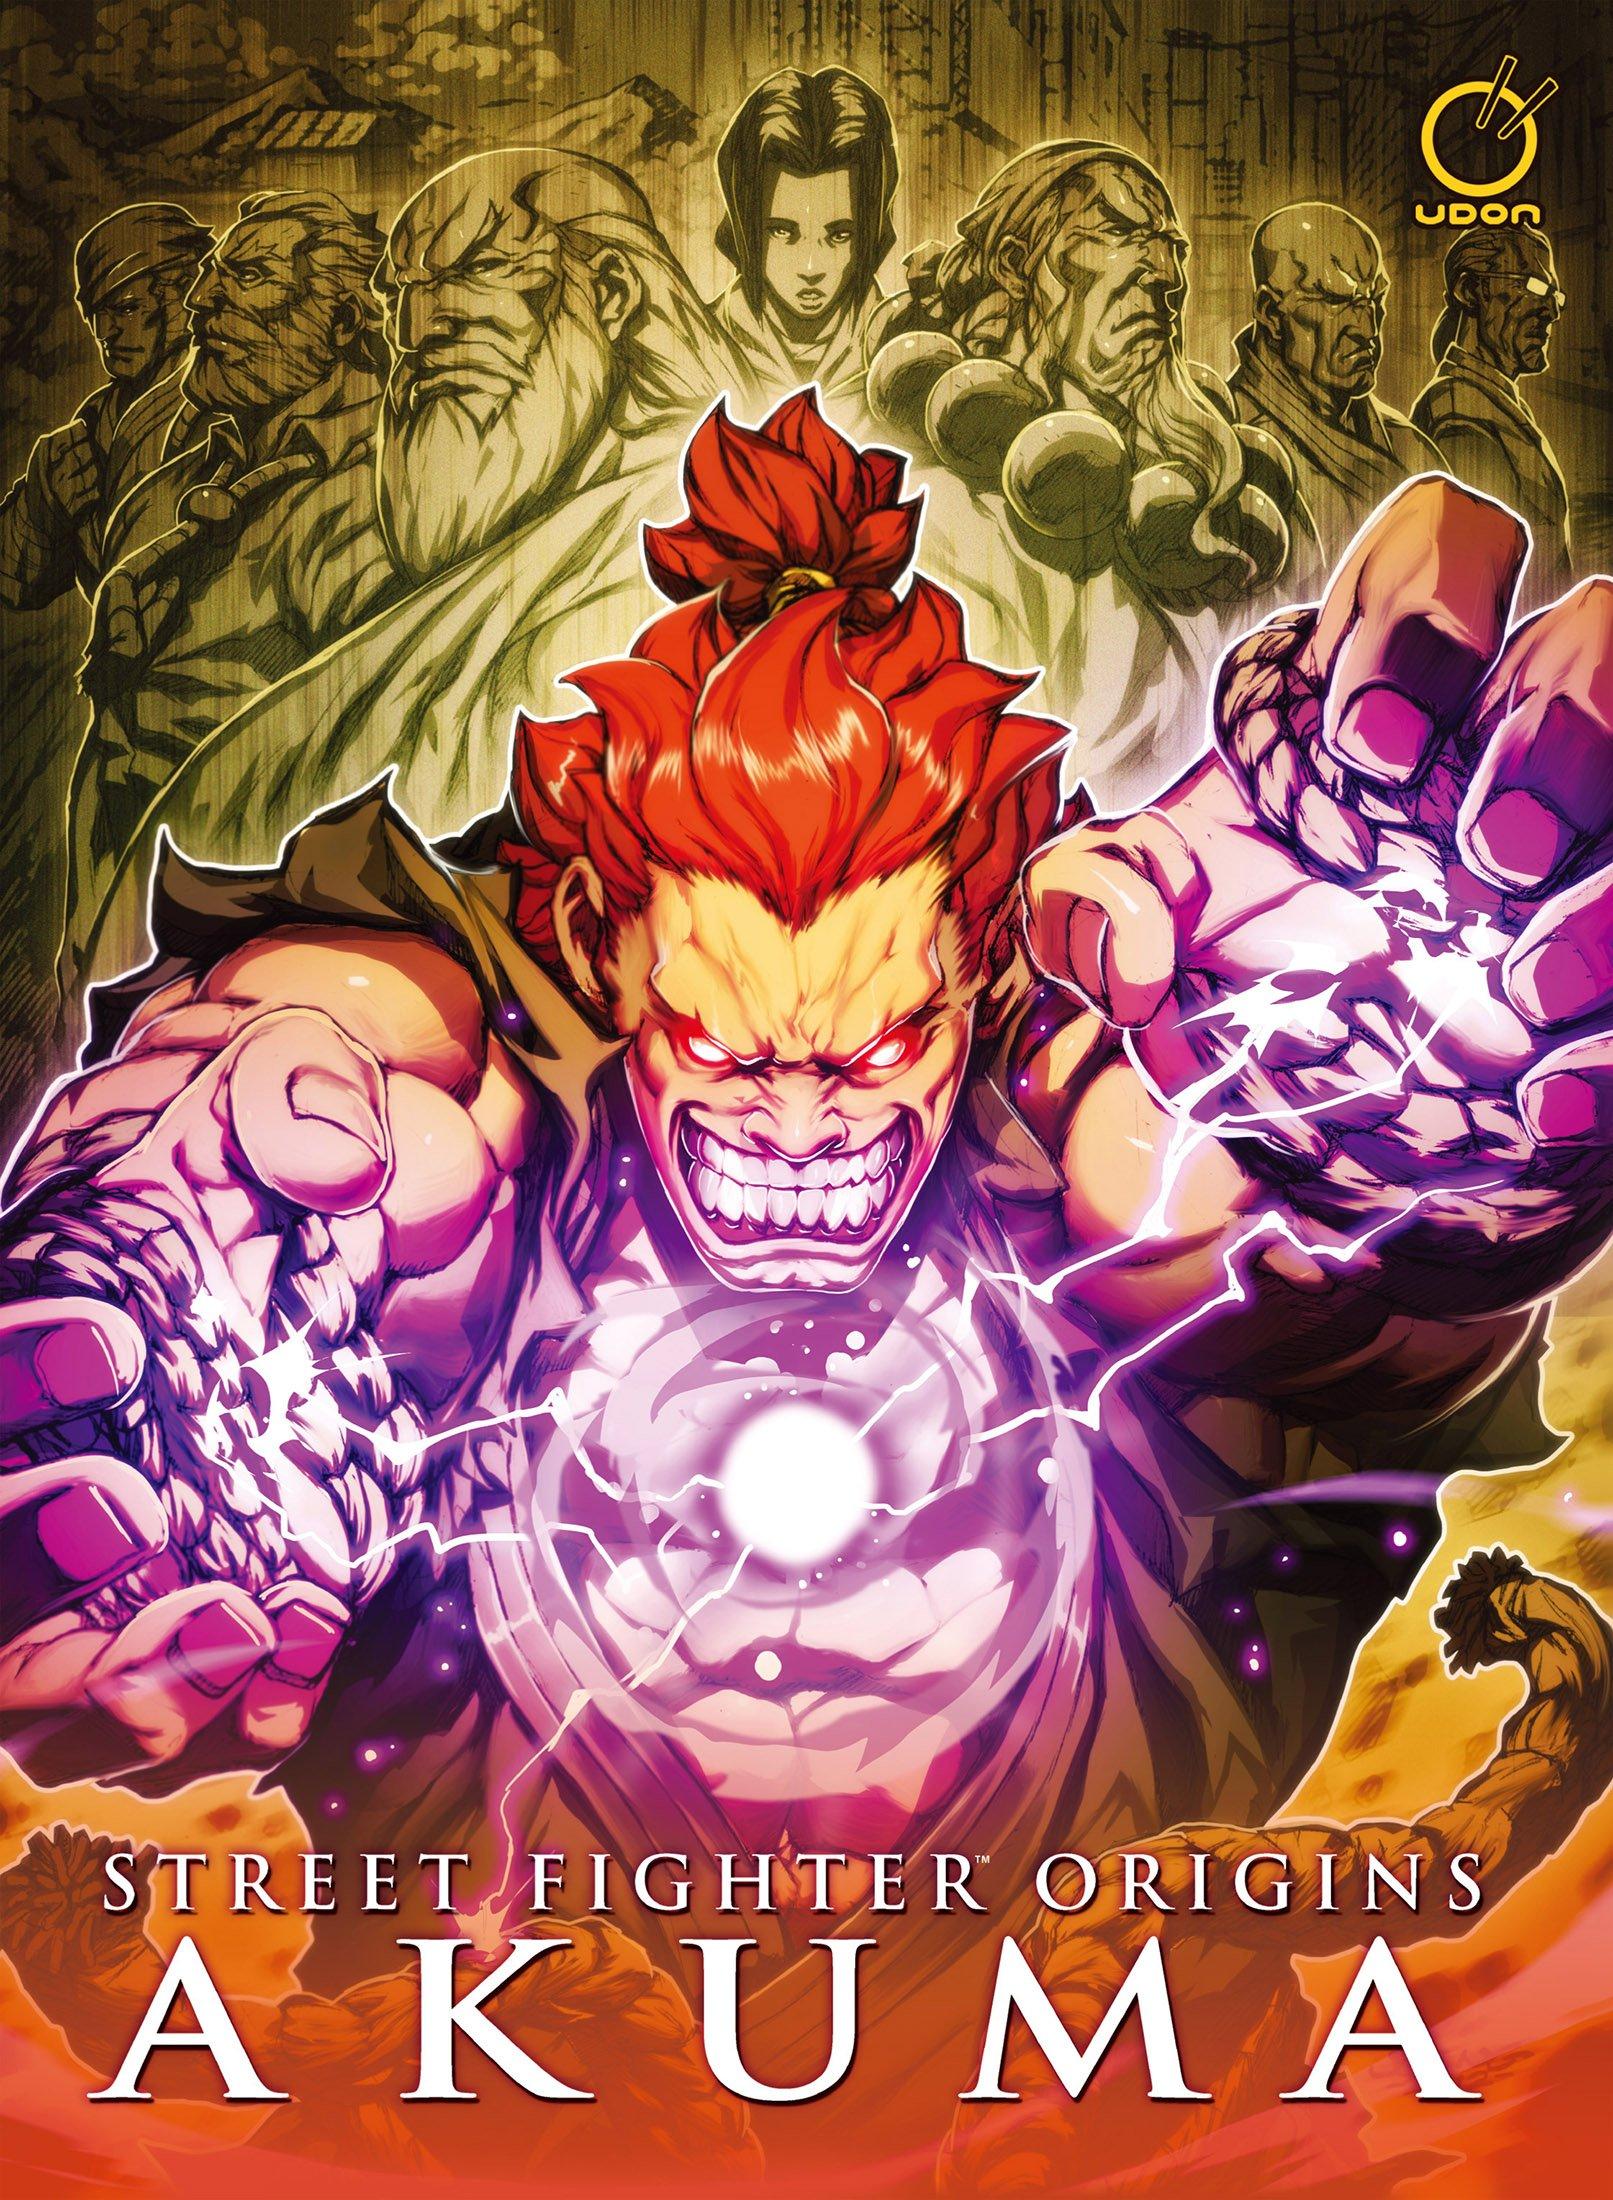 Street Fighter Origins - Akuma